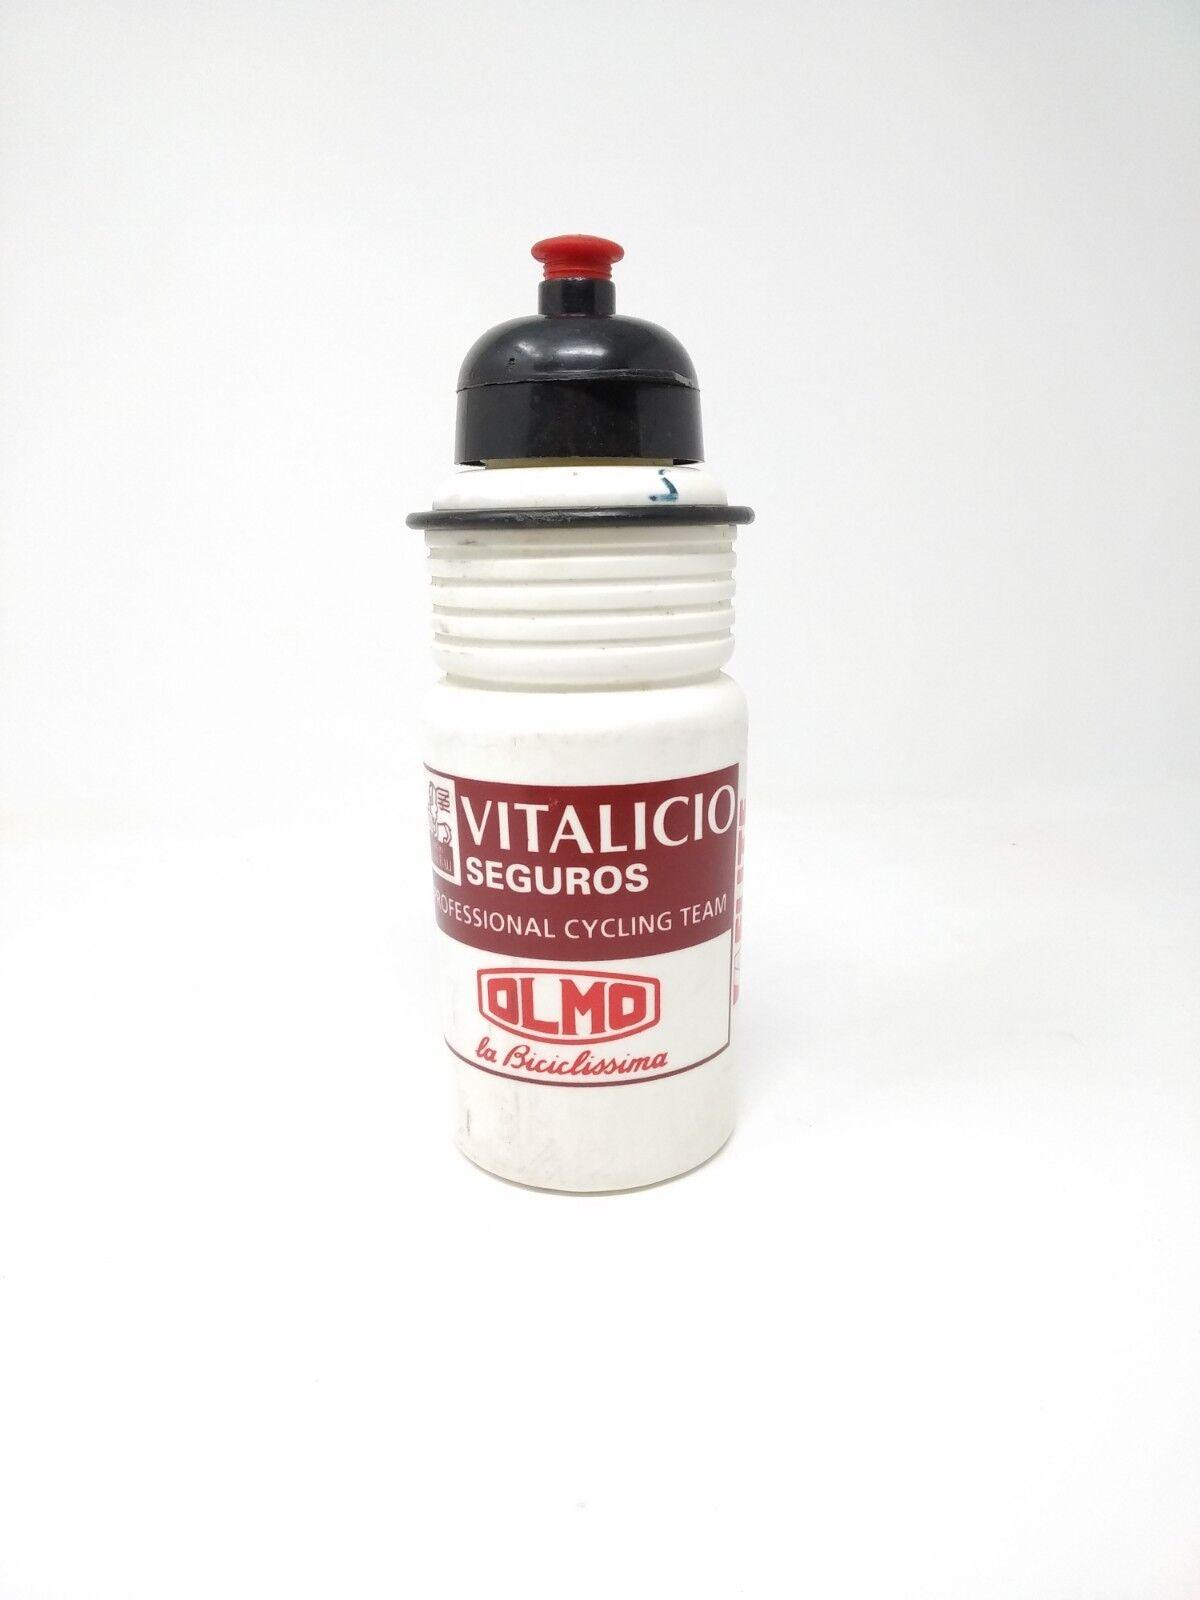 Vintage borraccia bottle elite Olmo Vitalicio seguros  pro Cycling team original